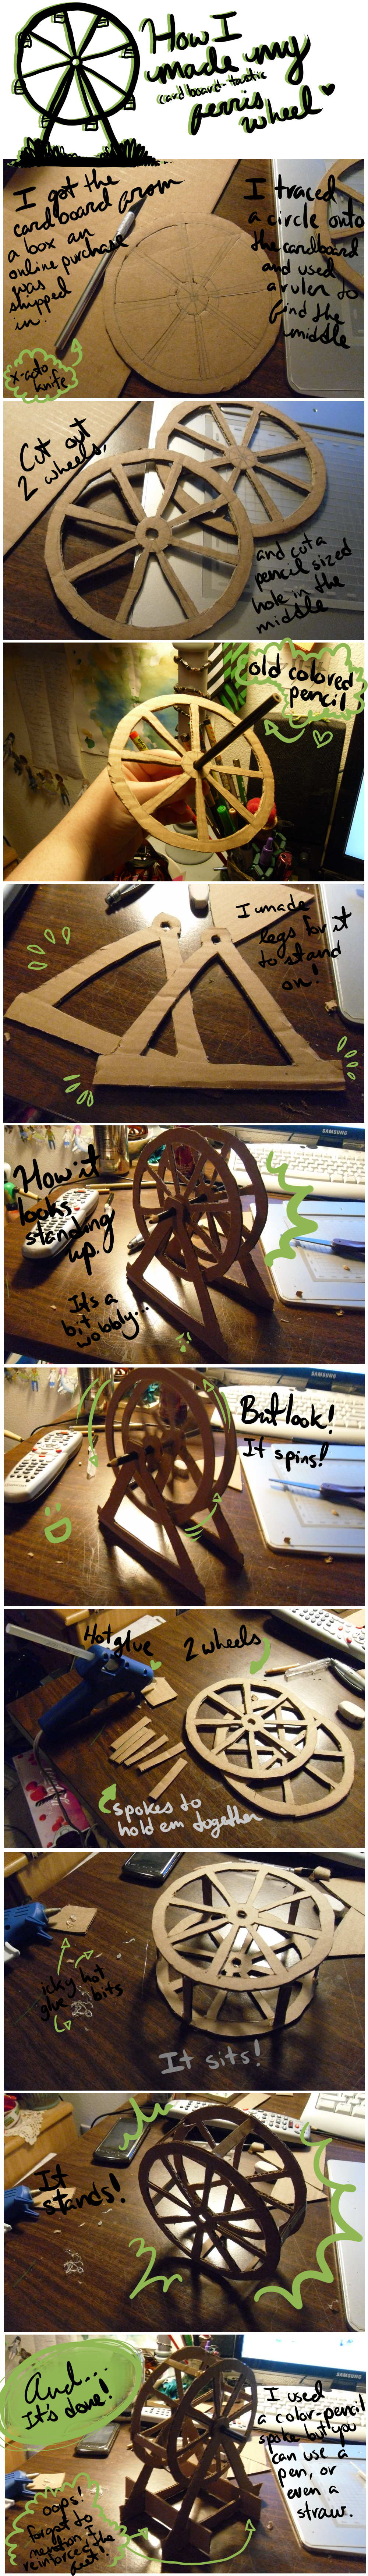 Cardboard Ferris Wheel by CrimsonPearls